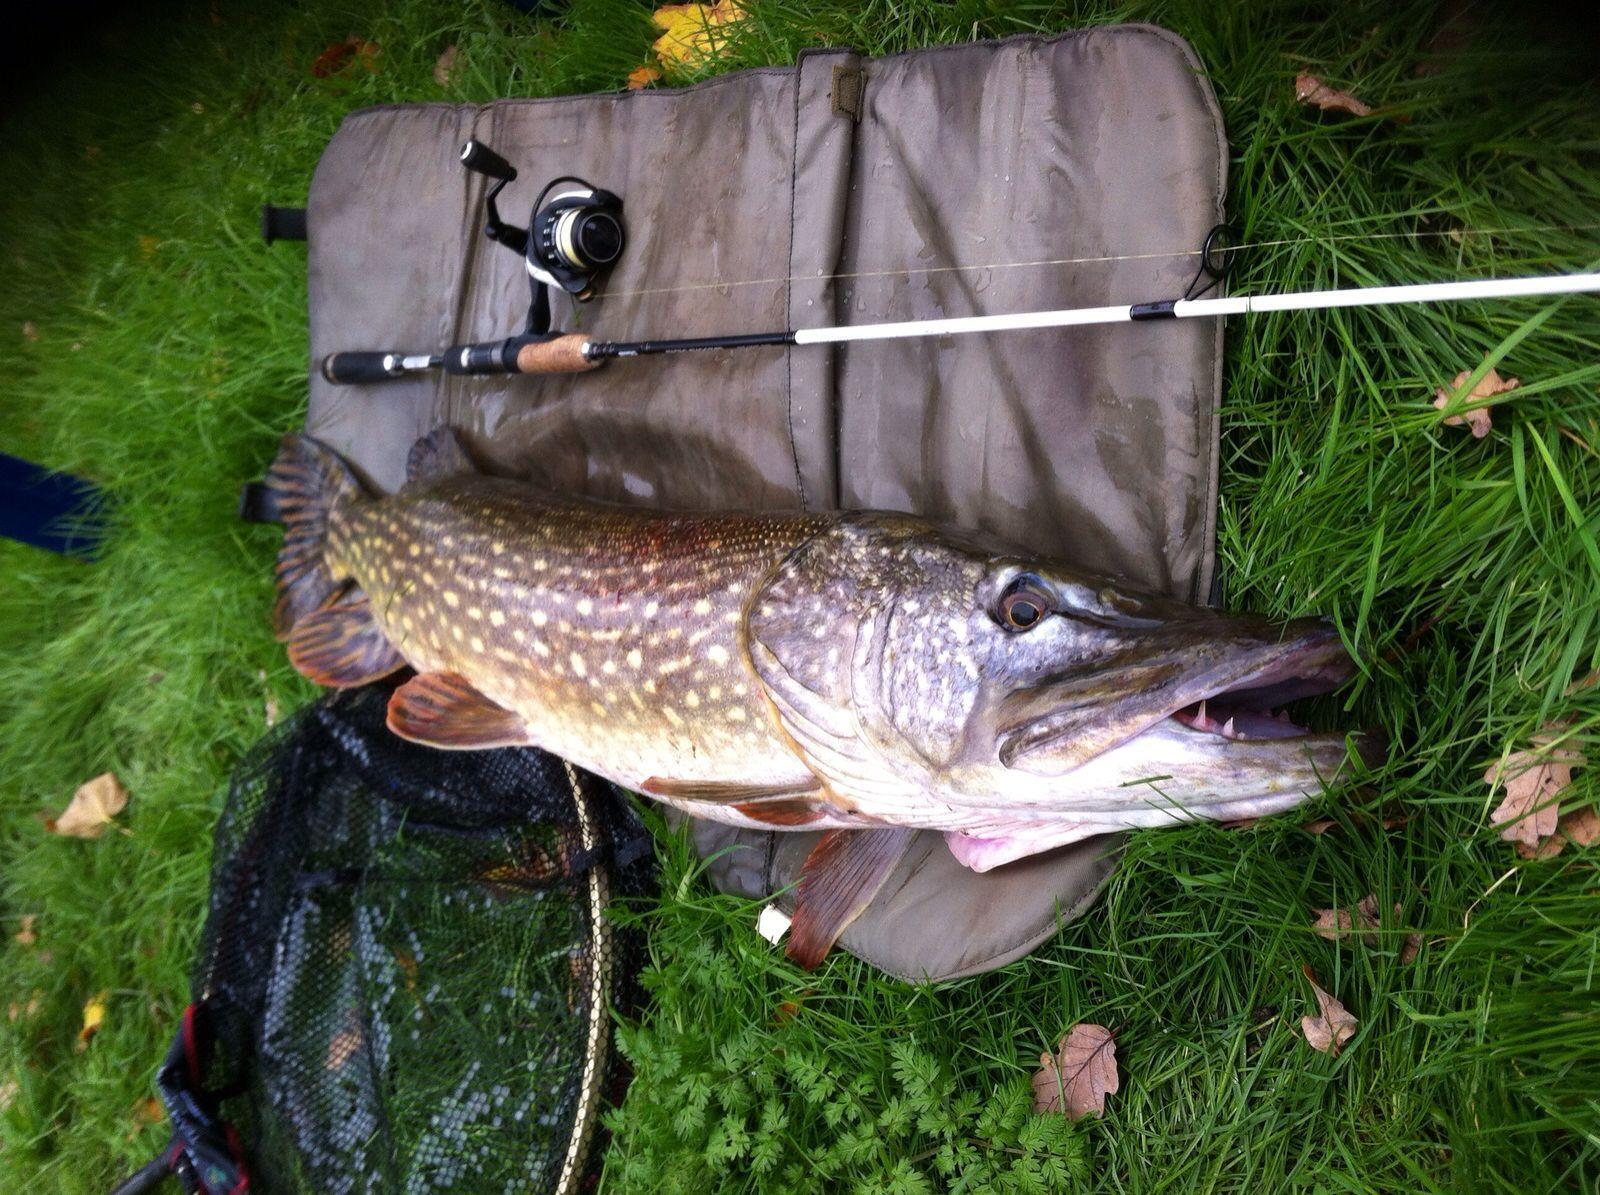 20-lb-pike-caught-pleasure-fishing-on-river-seven-larford-no-name-sorry